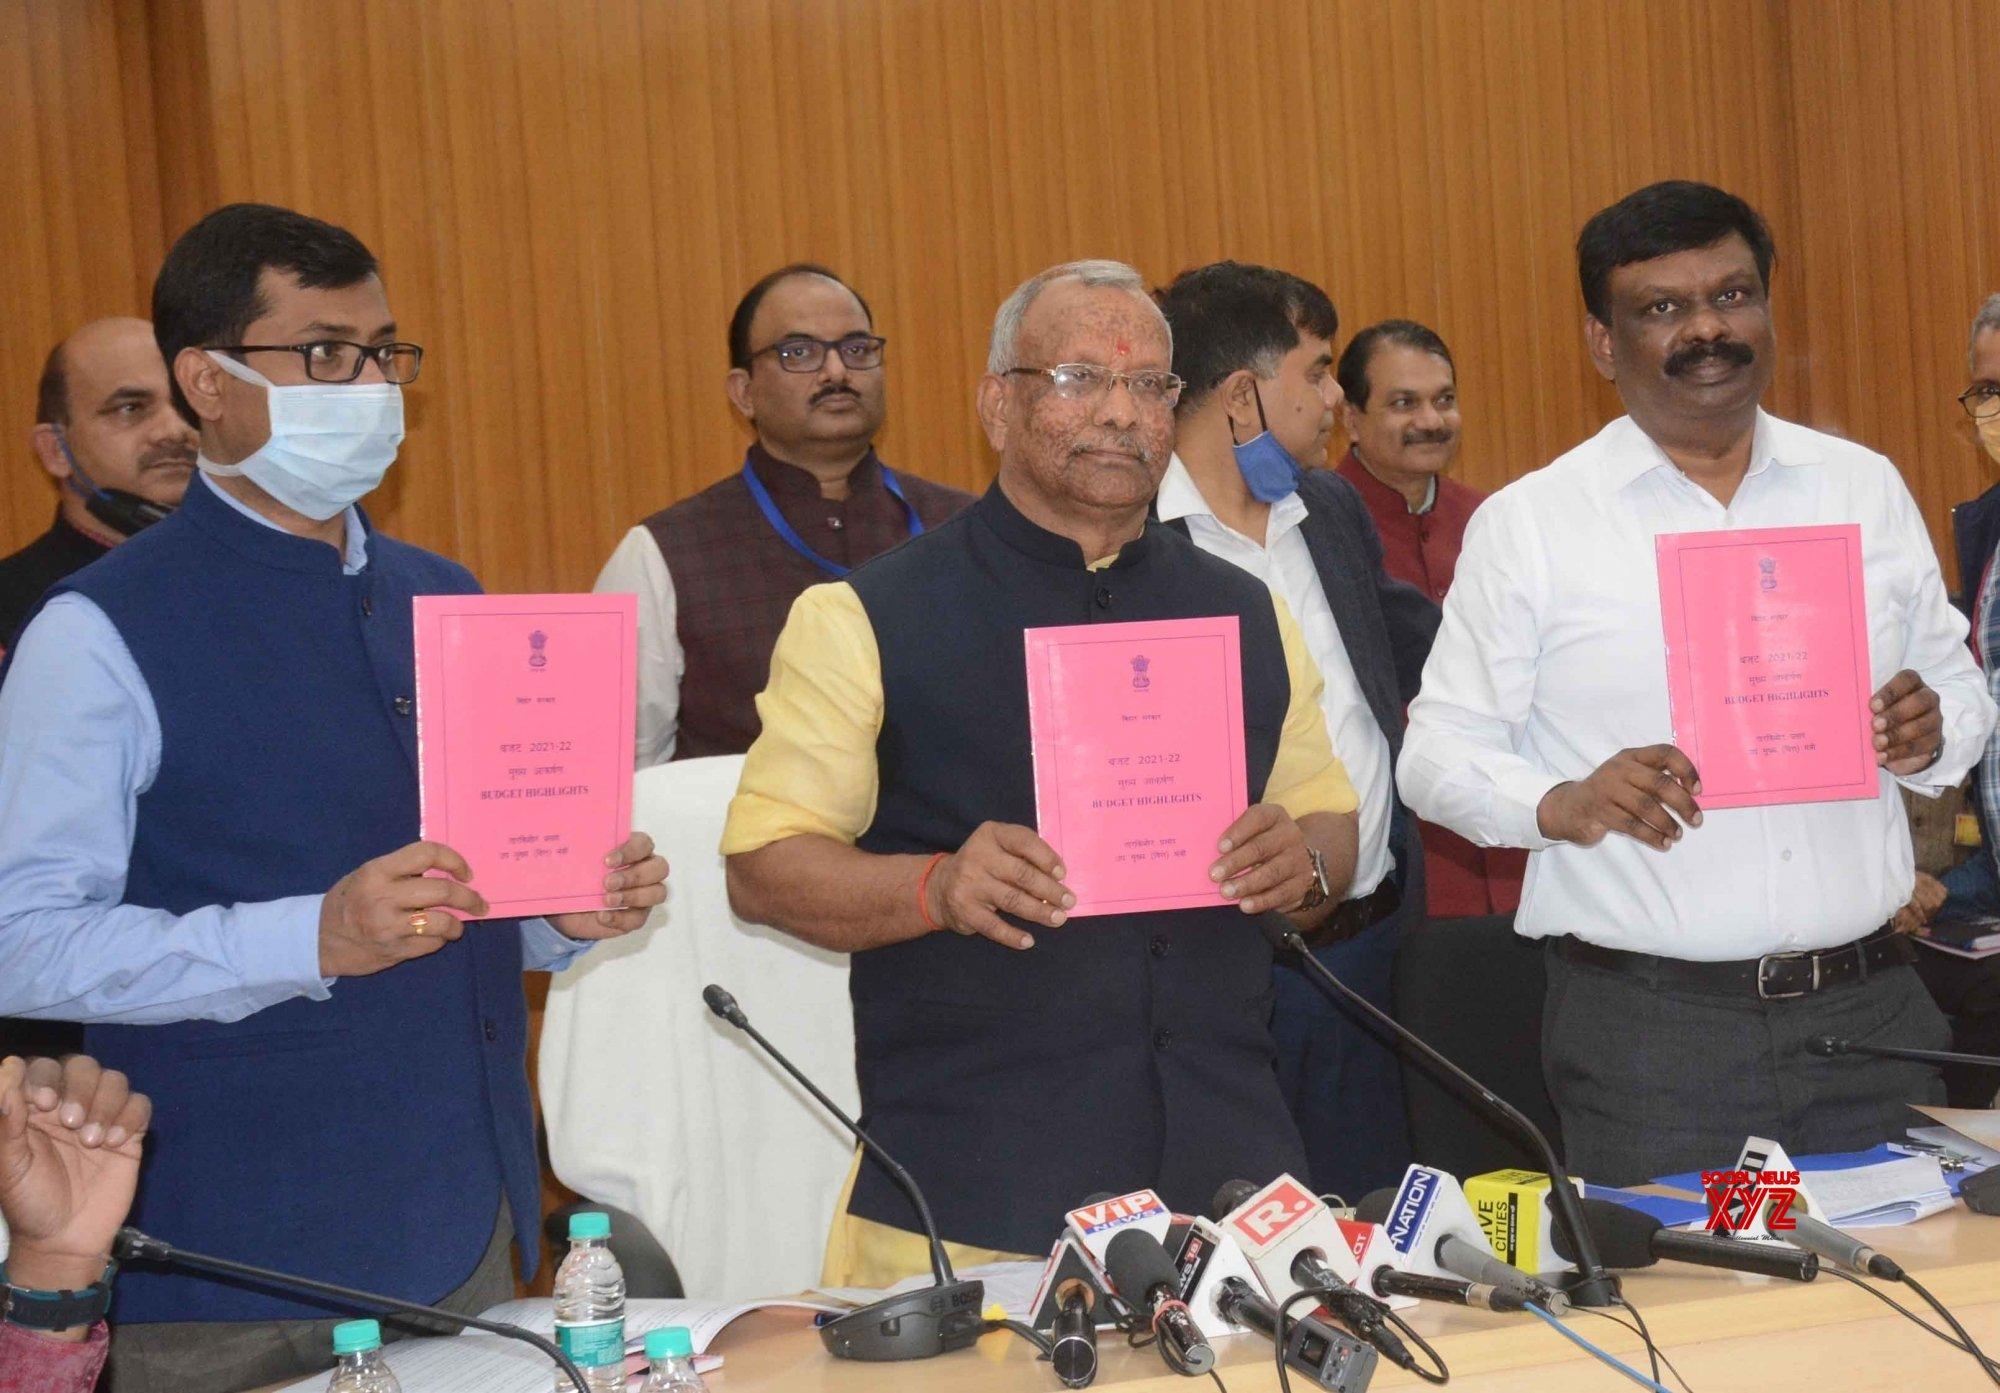 Patna: Deputy CM and state Finance Minister Tarkishore Prasad (C) release budget highlights after the Bihar State Budget Session, in Patna on Monday February, in Patna on - Monday 22nd February, 2021 #Gallery